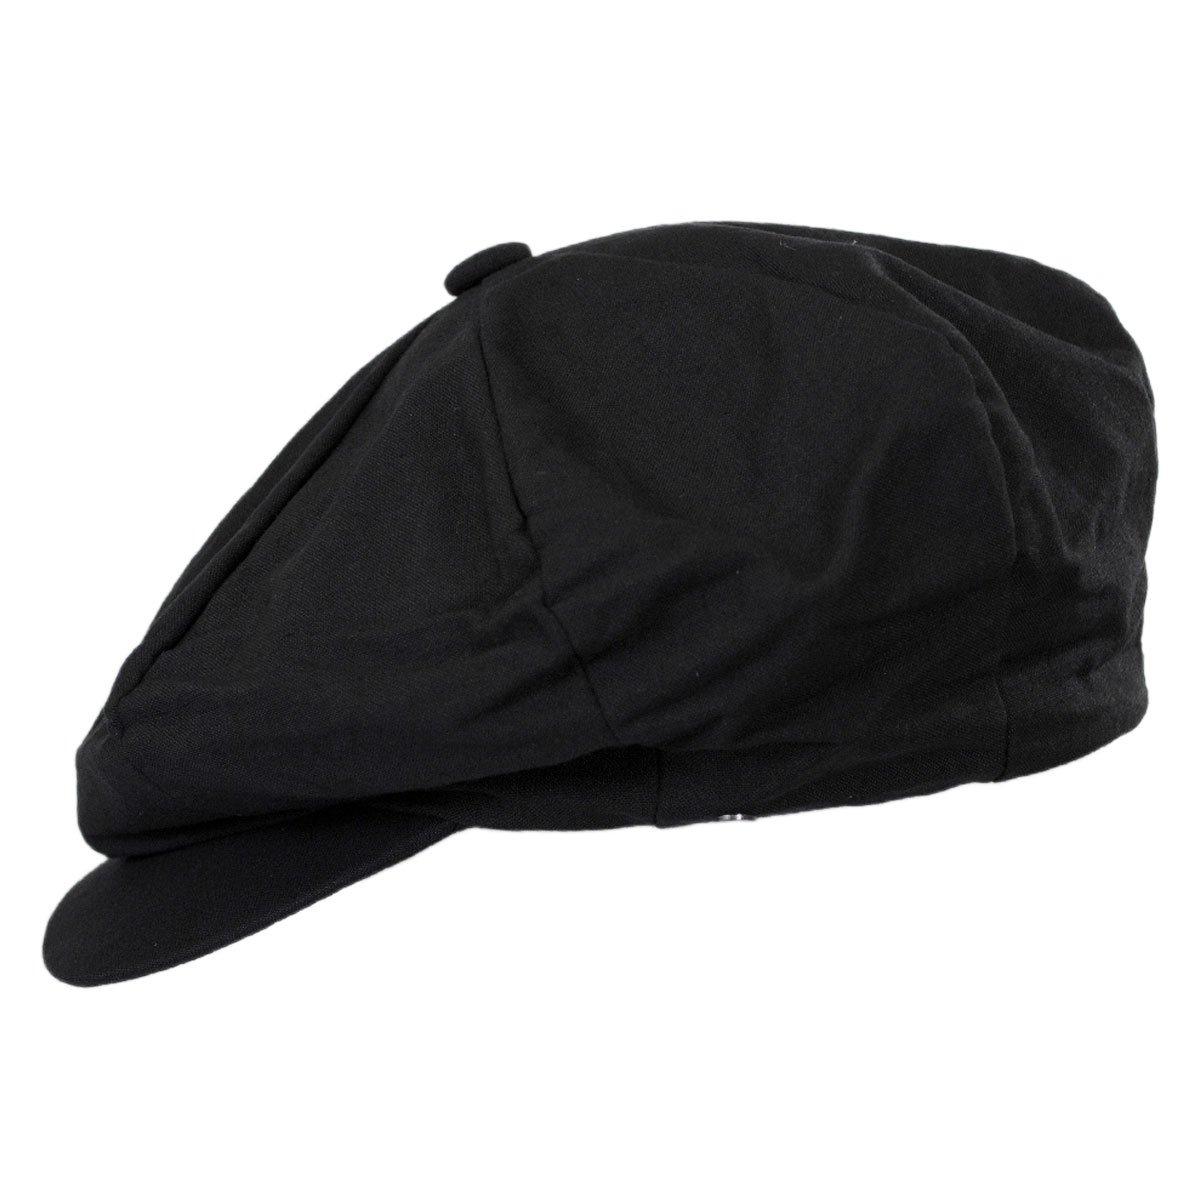 34abdd58 Linen Blend Big Apple Cap (Black) at Amazon Men's Clothing store: